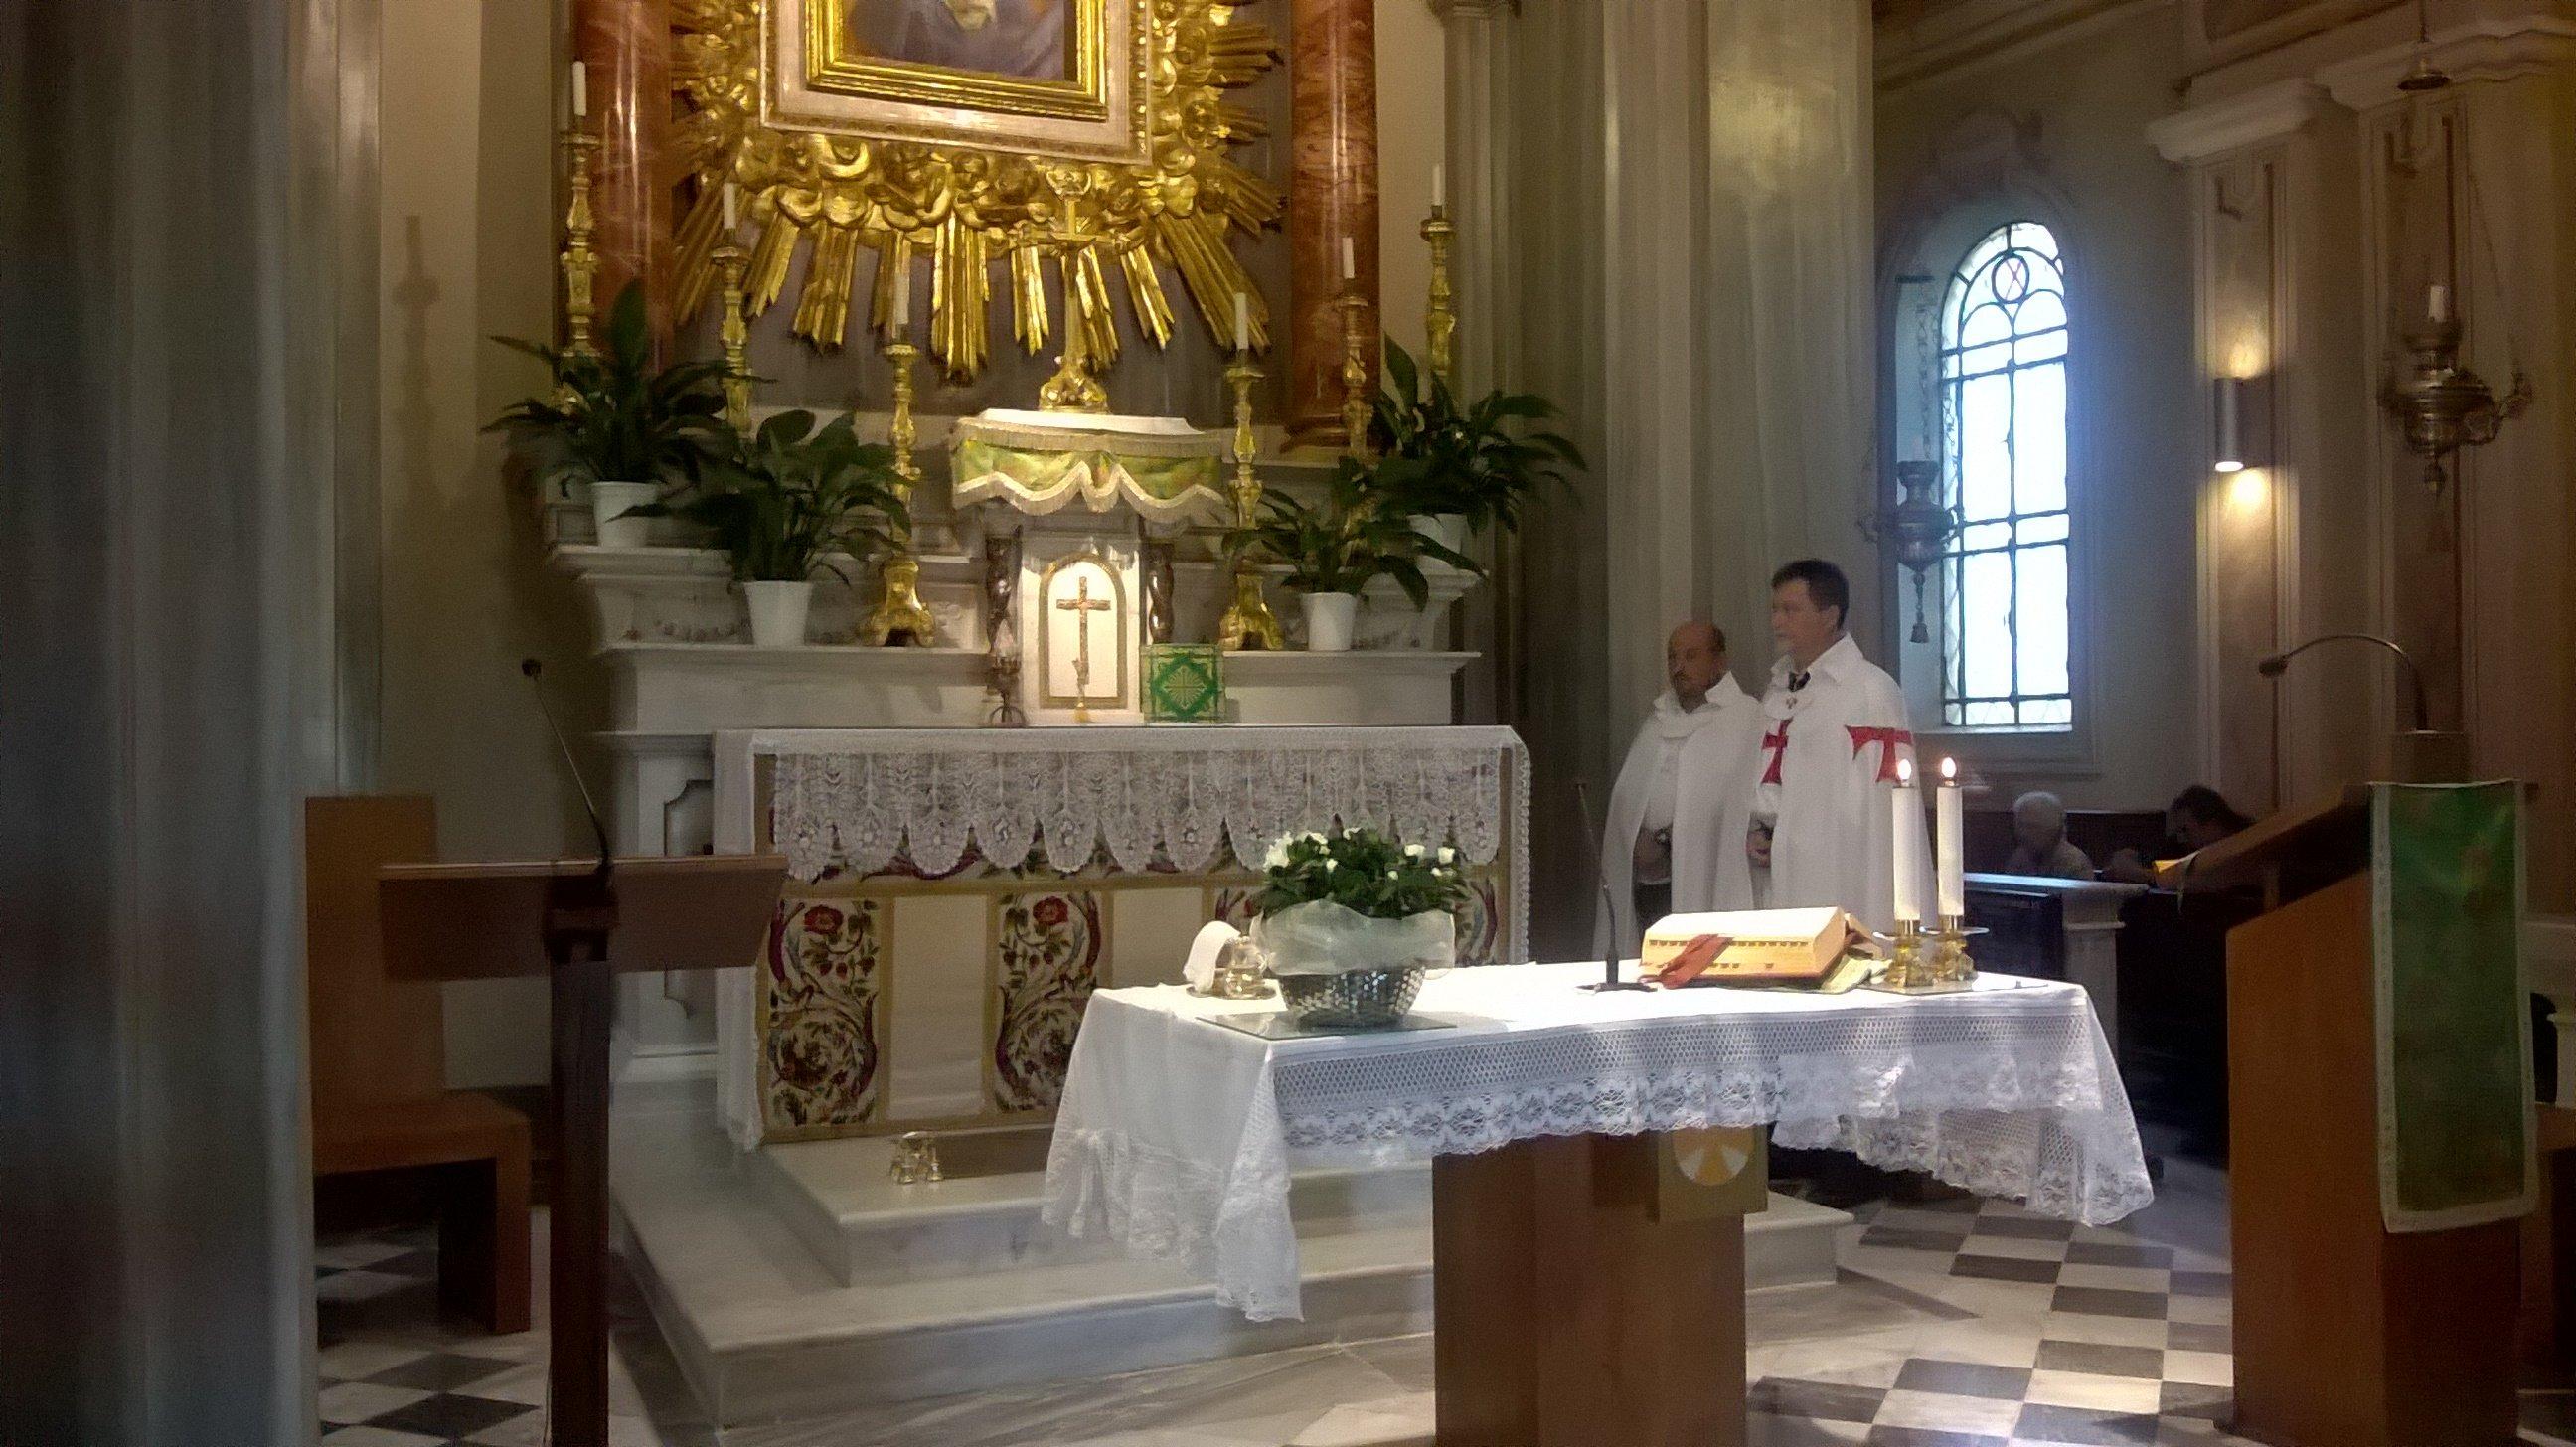 Santa Messa, Cuneo